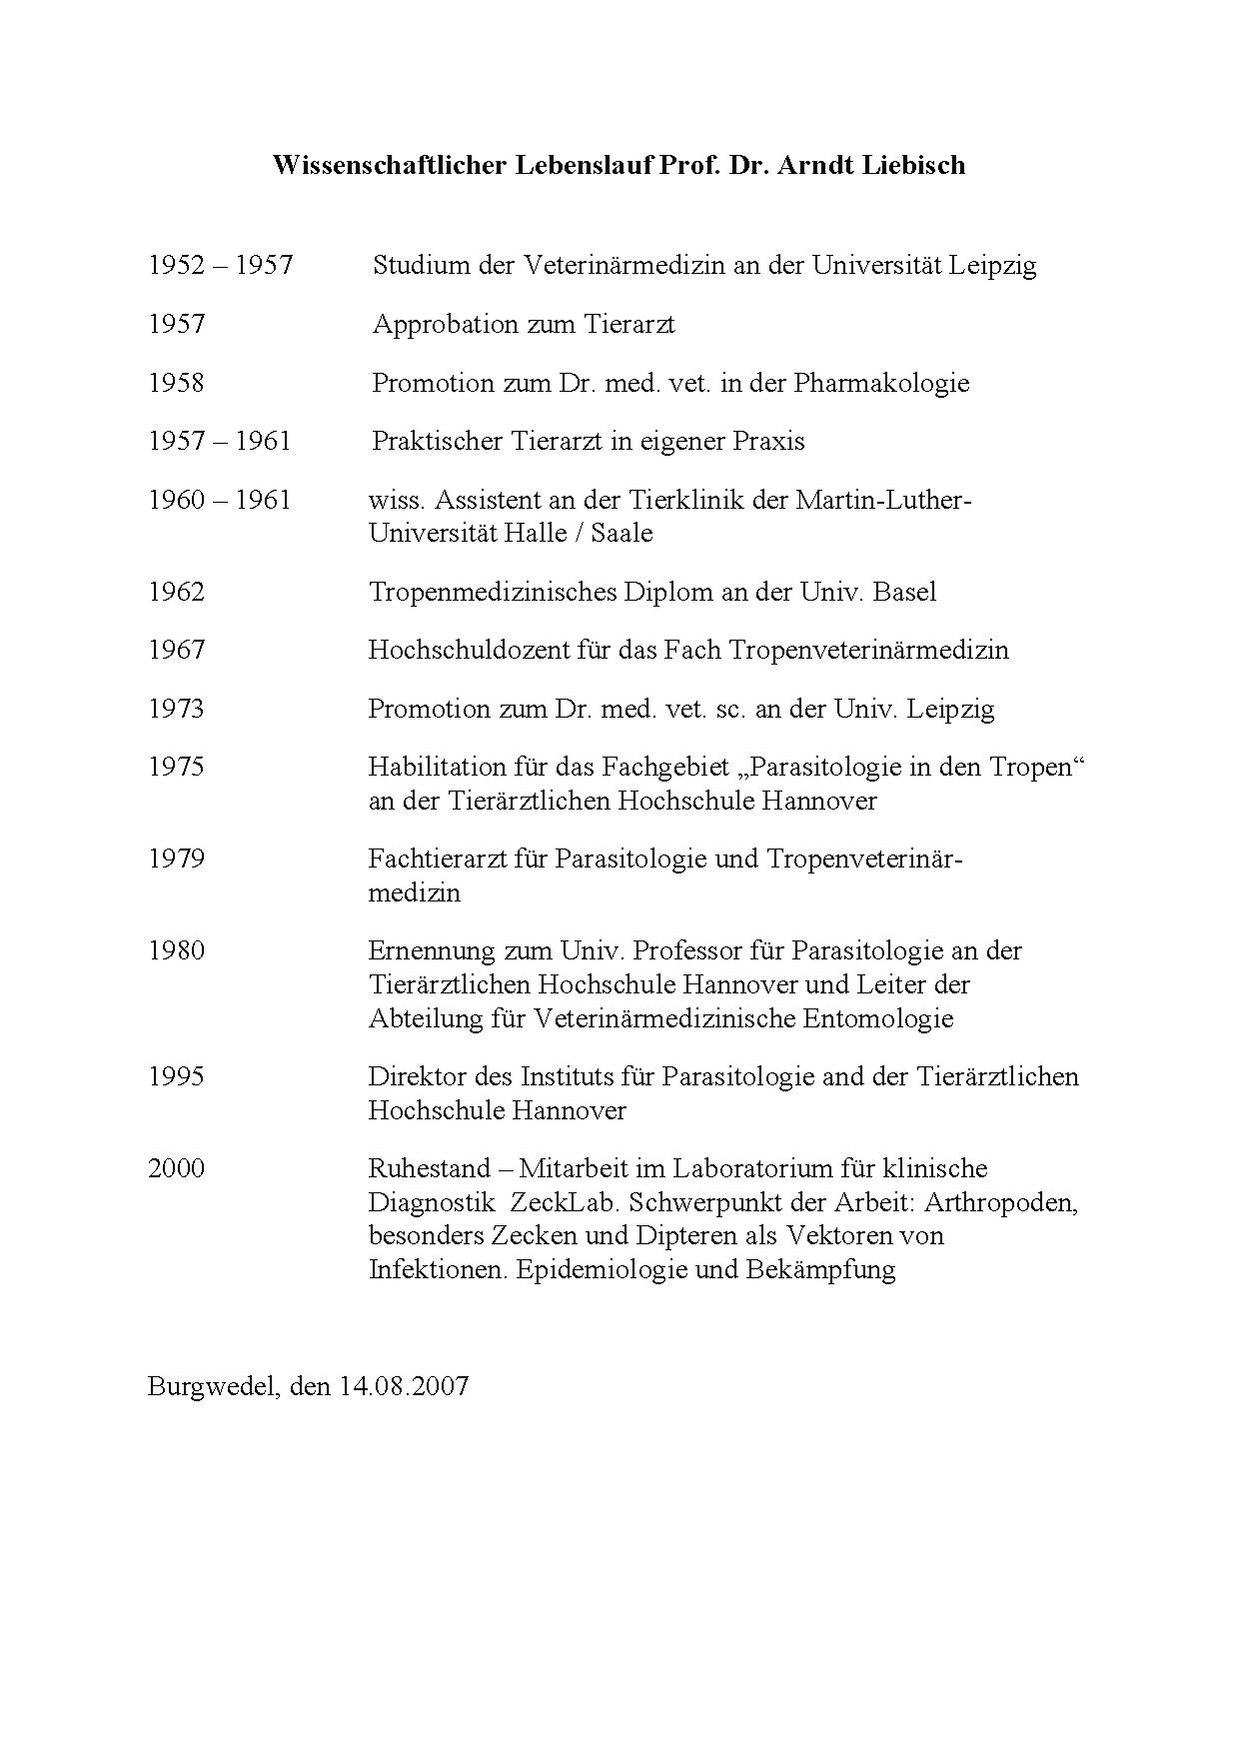 lebenslauf als pdf datei igor sachs. lebenslauf als pdf datei ...